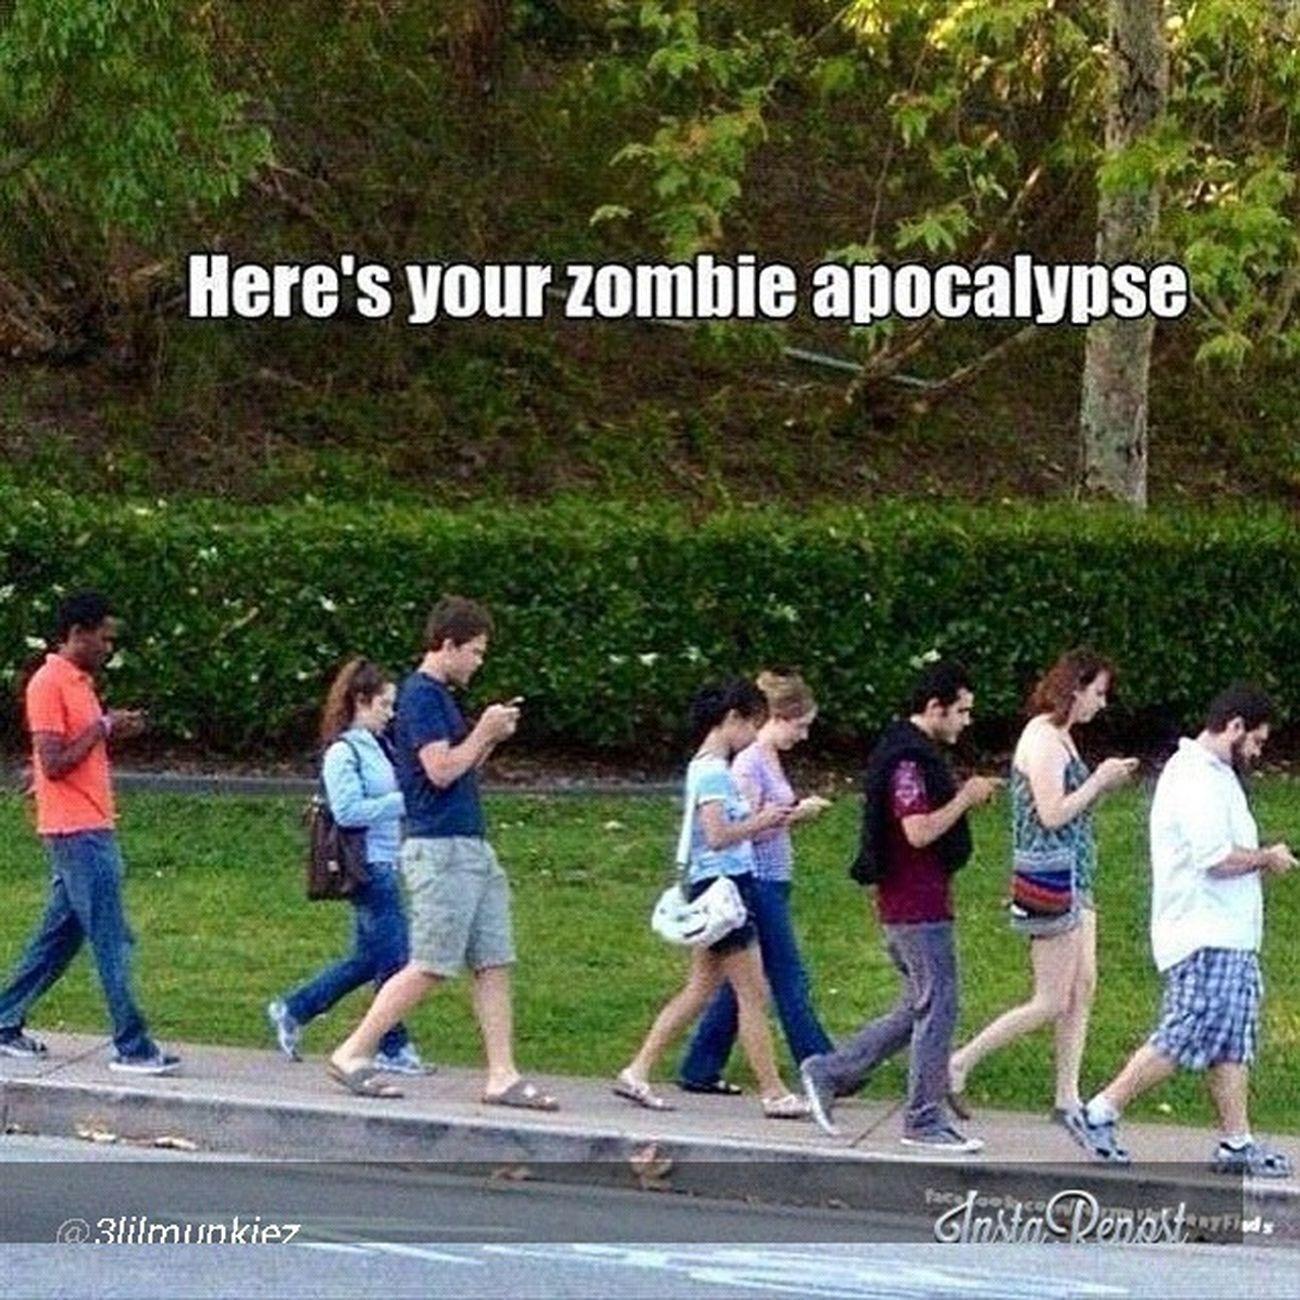 It's already here! Zombieapocalypse Zombie Zombies